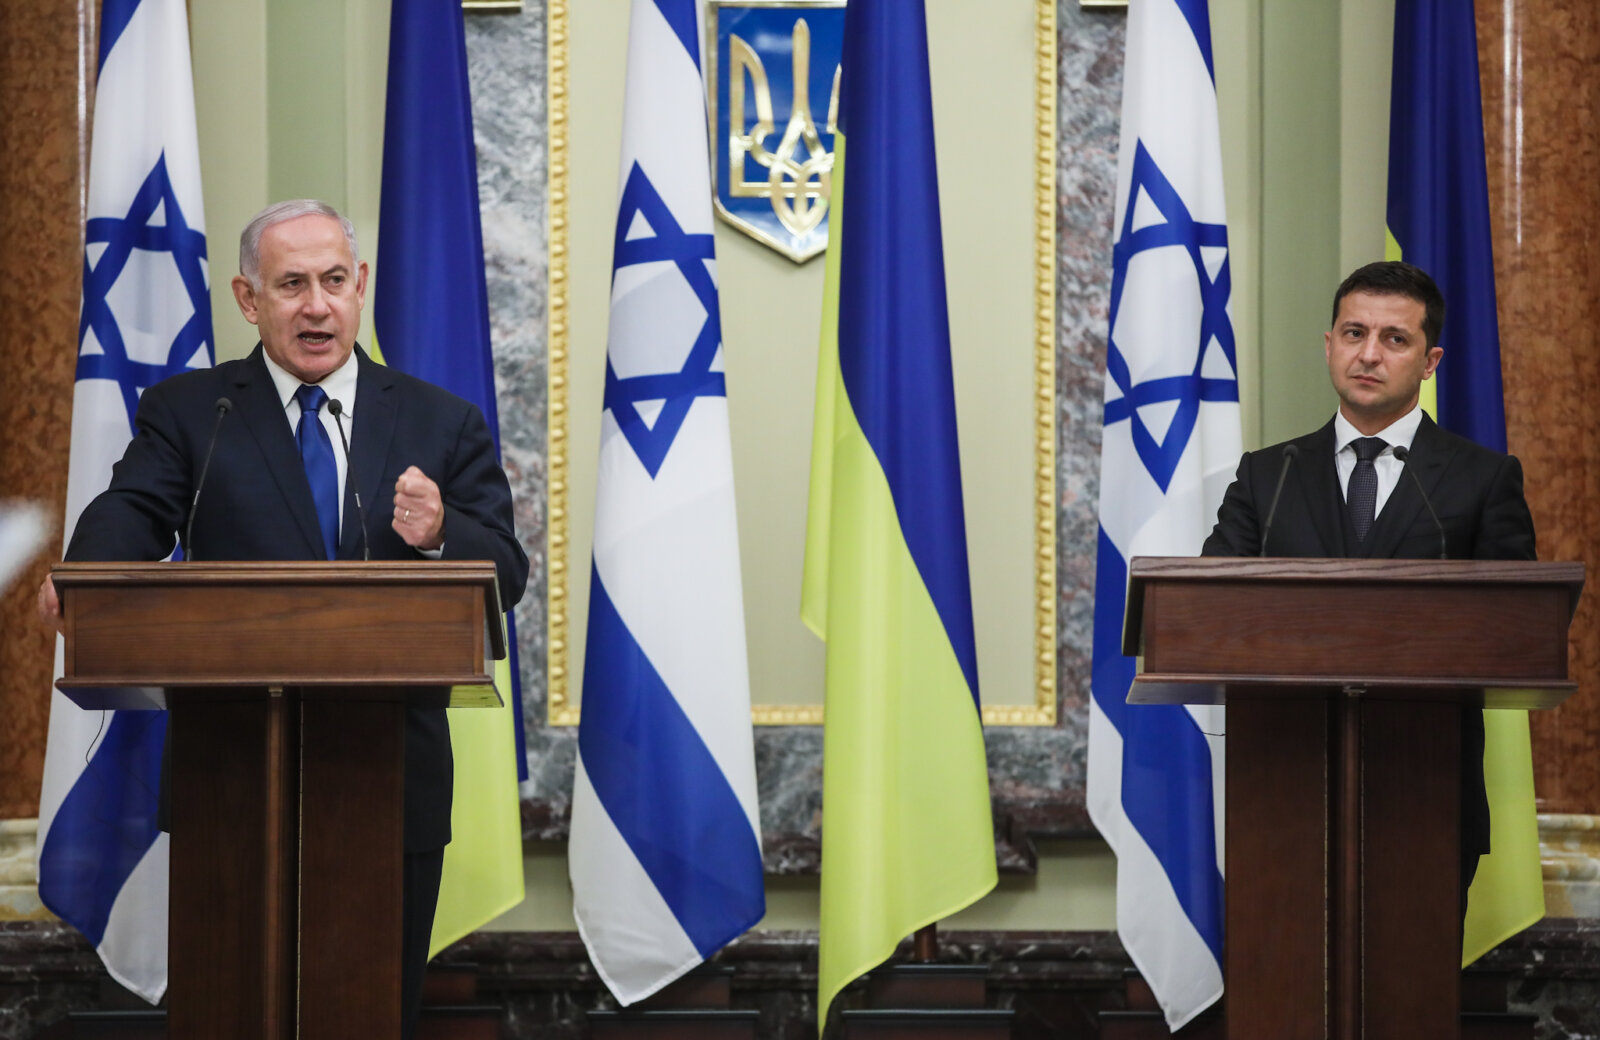 Netanyahu Zelensky 2